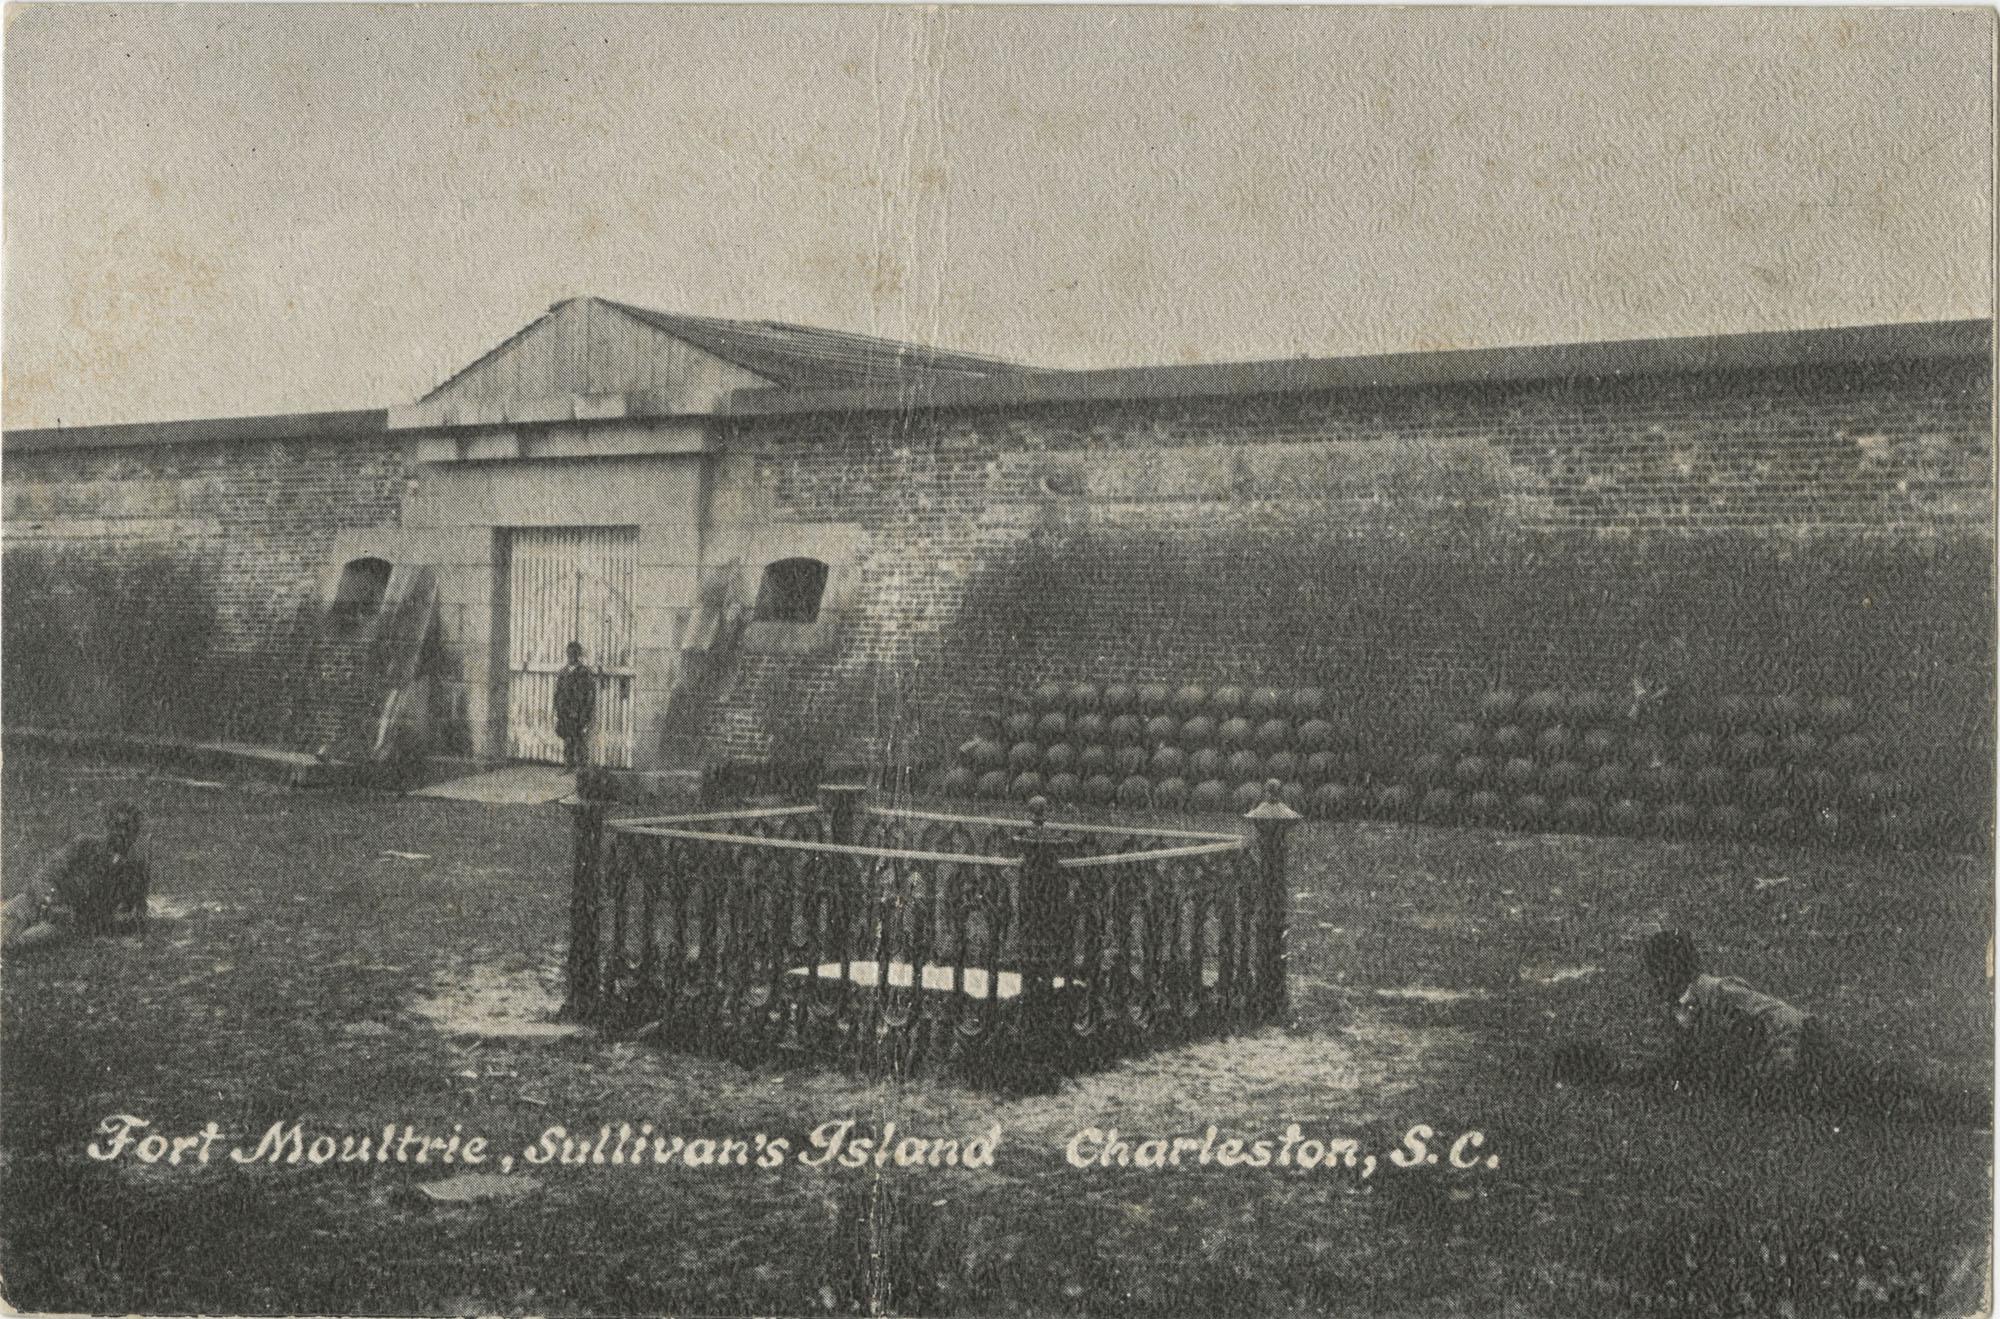 Fort Moultrie, Sullivan's Island Charleston, S.C.